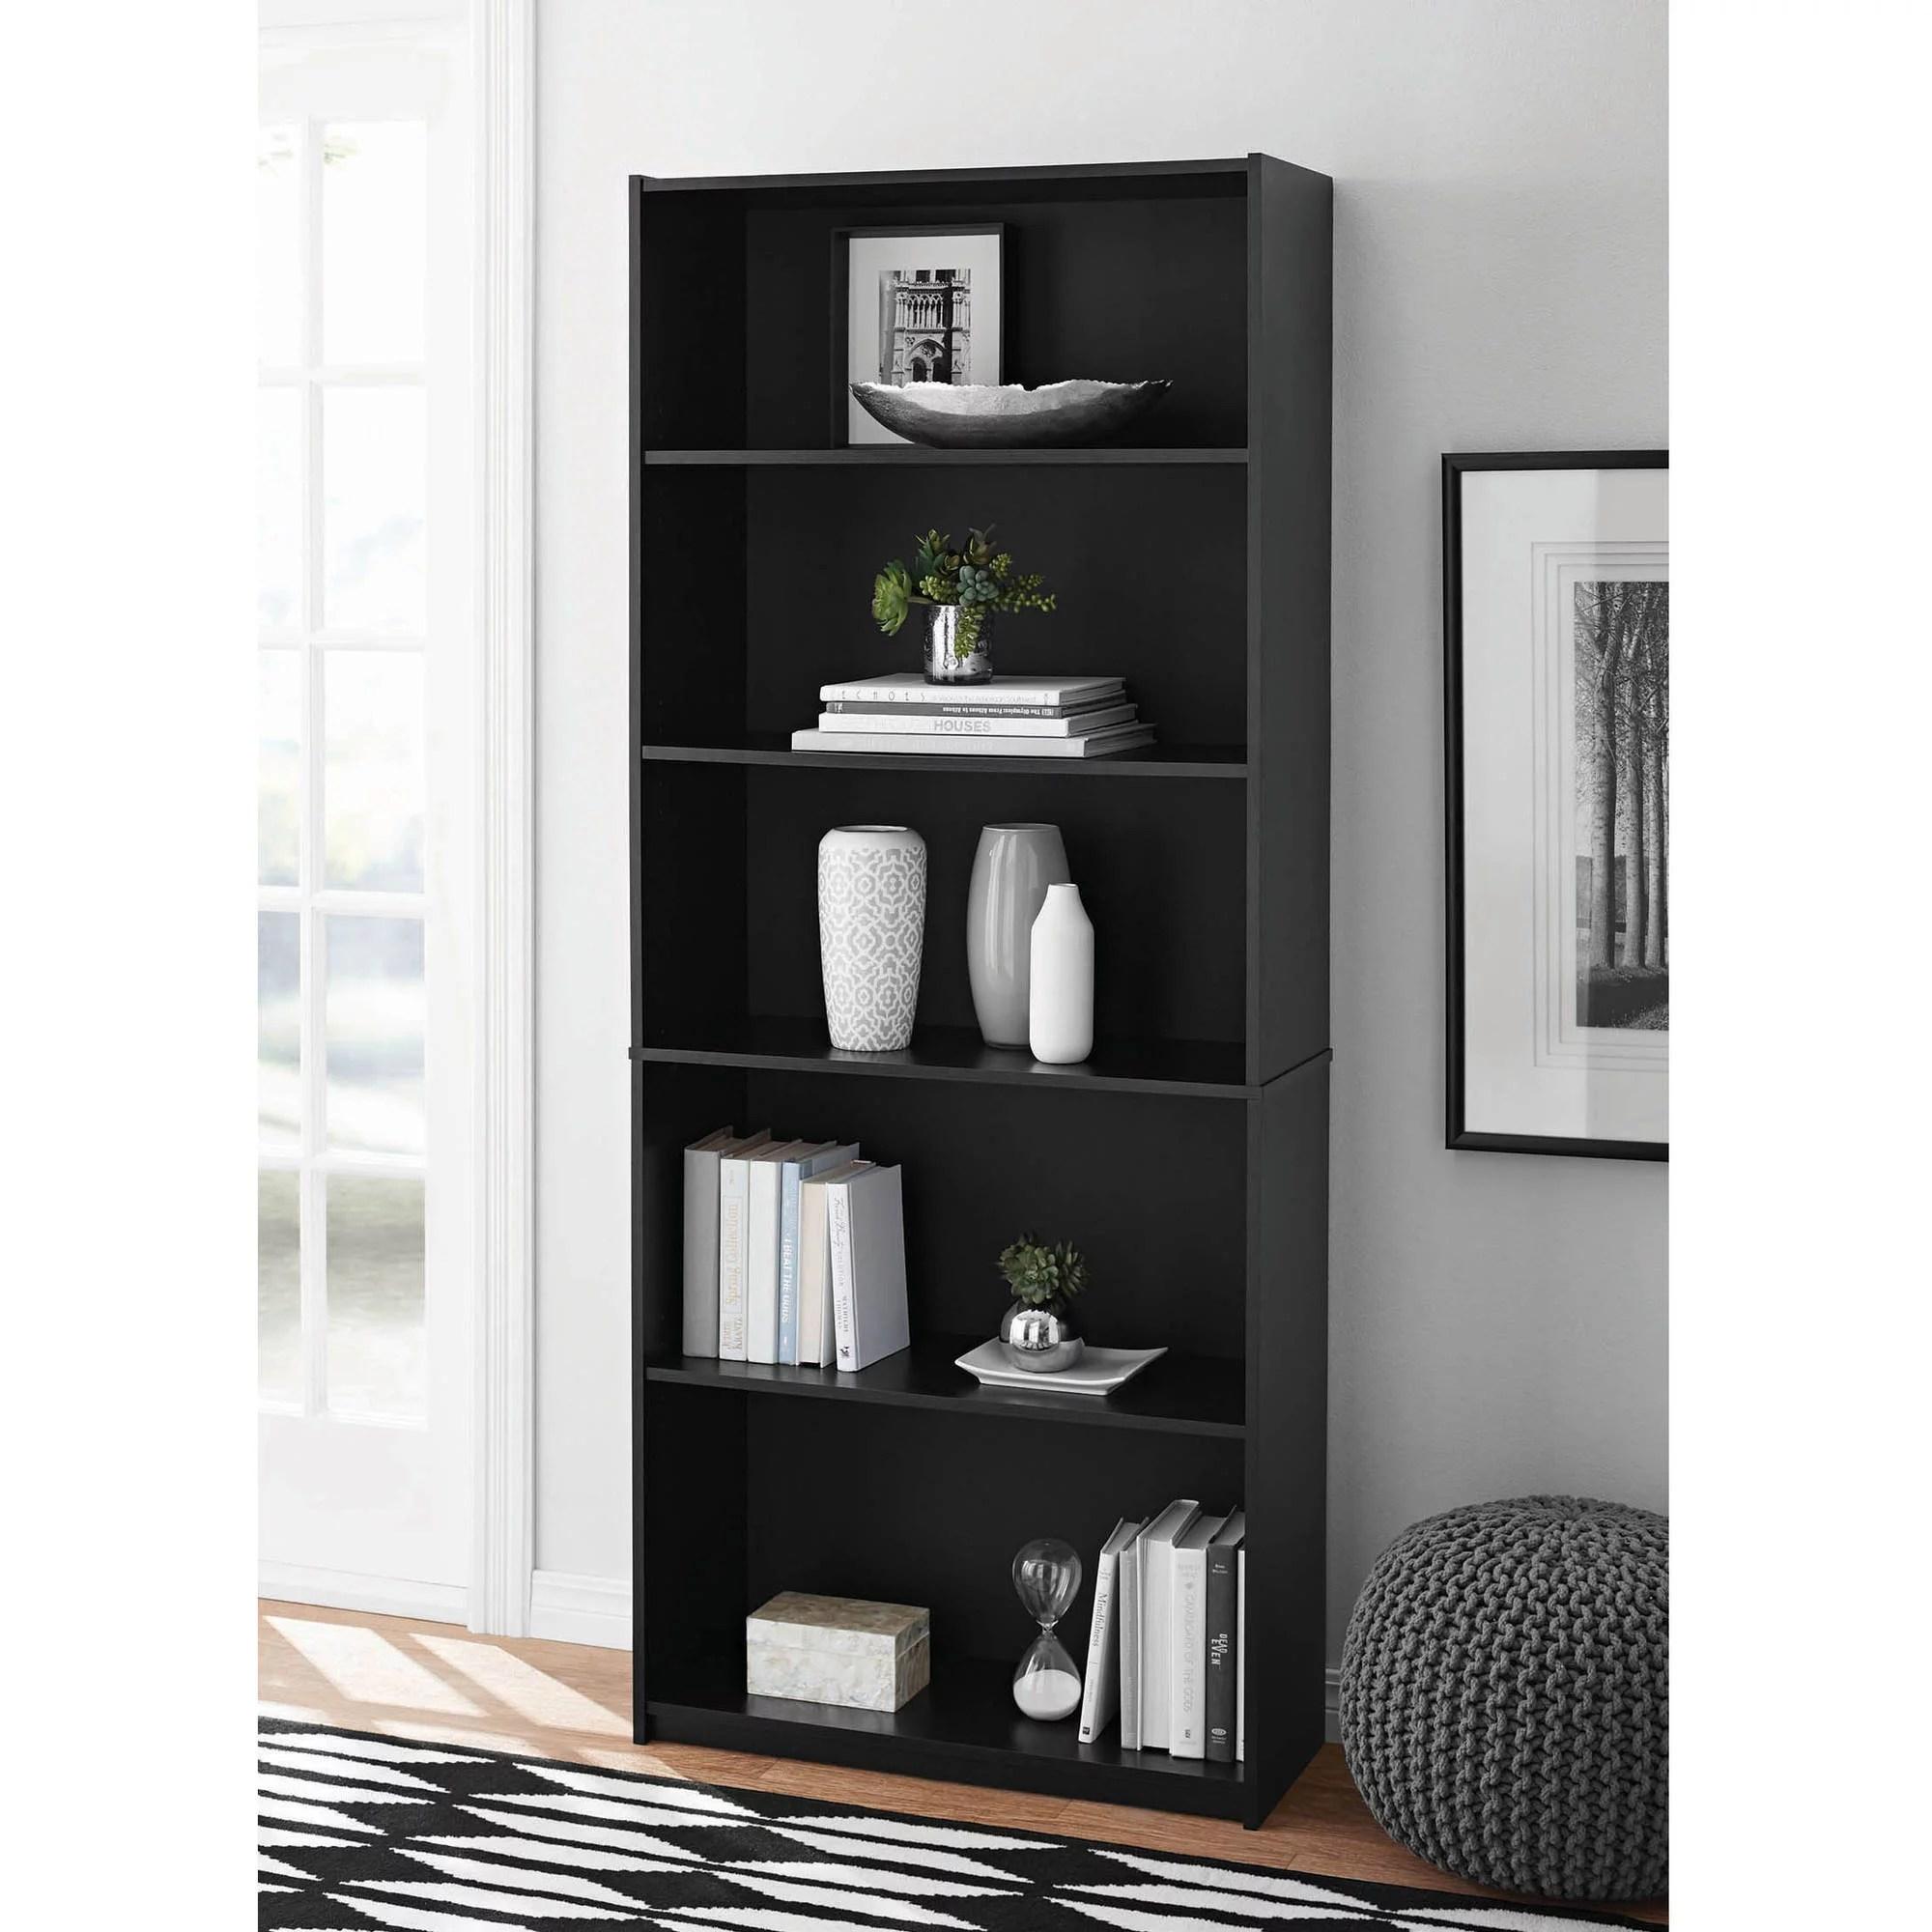 Bookcase 50 Inches Wide